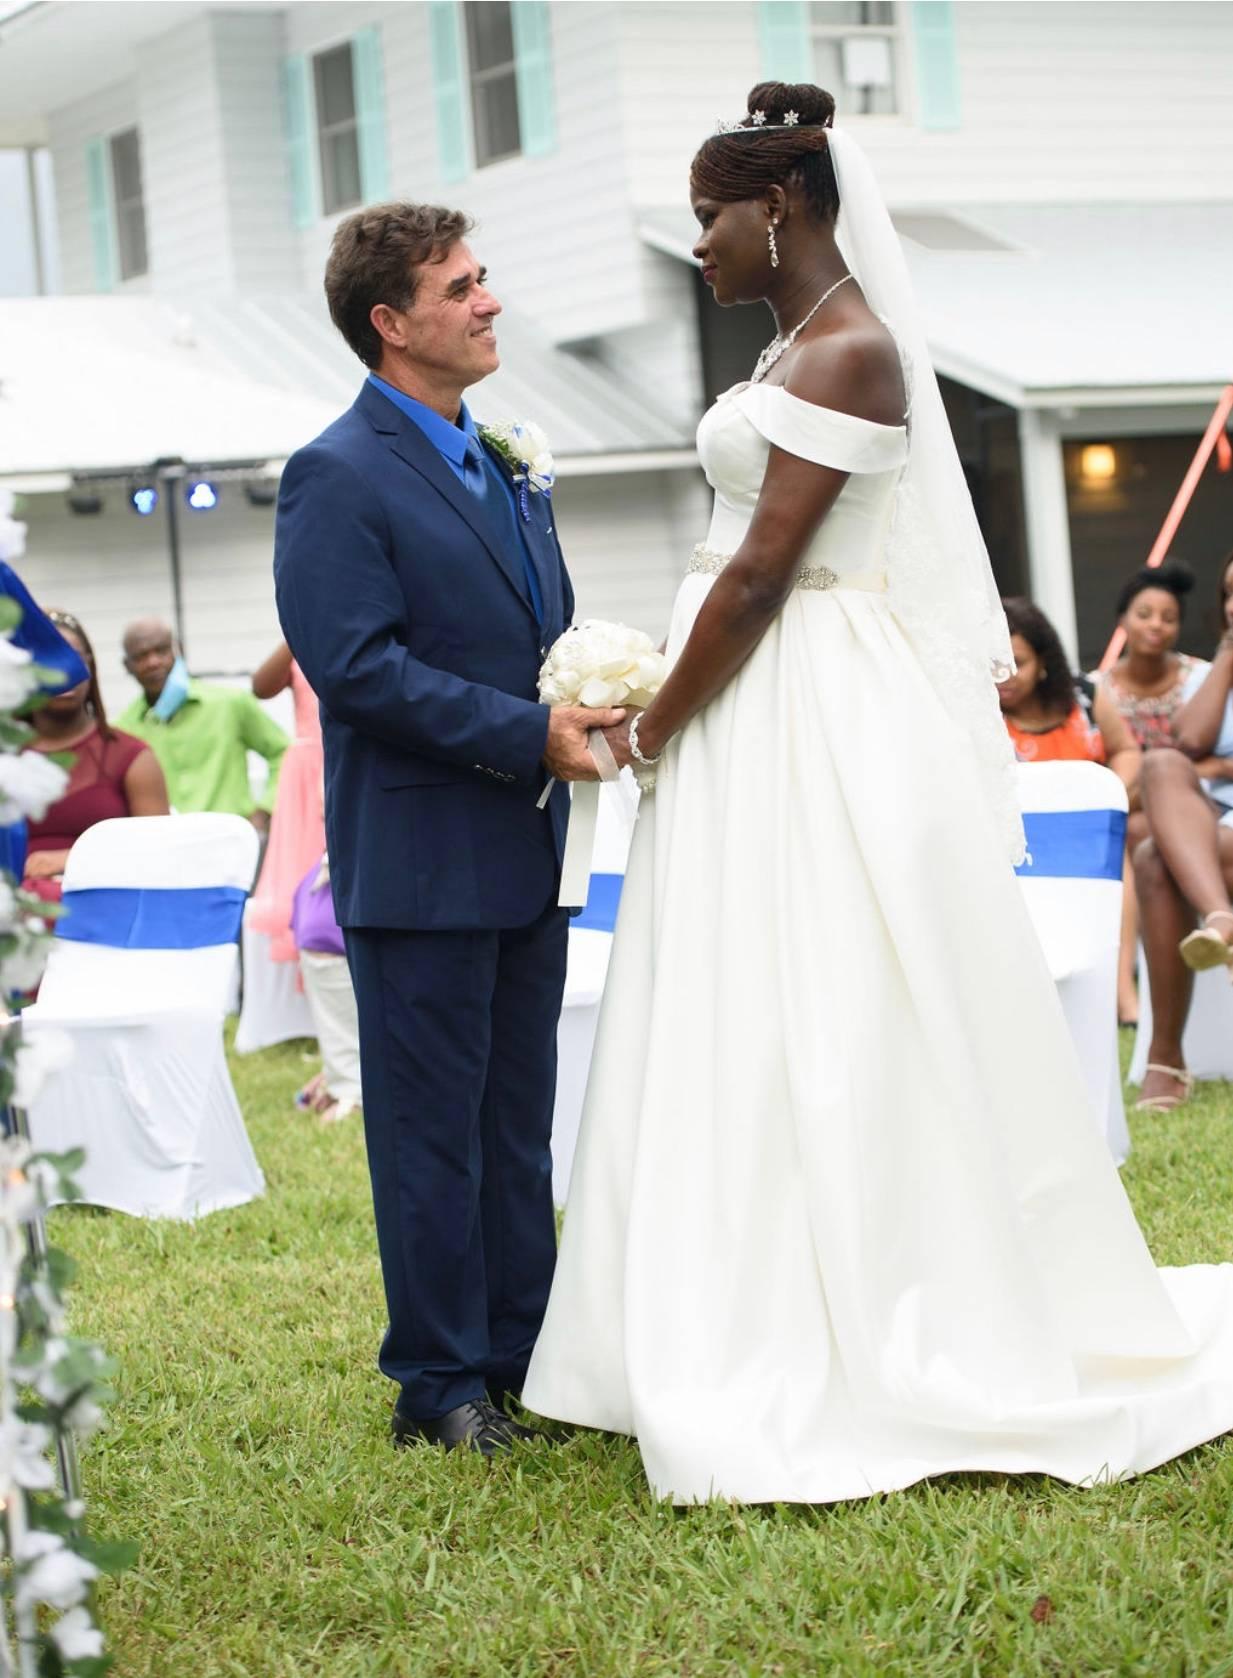 Mr. and Mrs. Santo